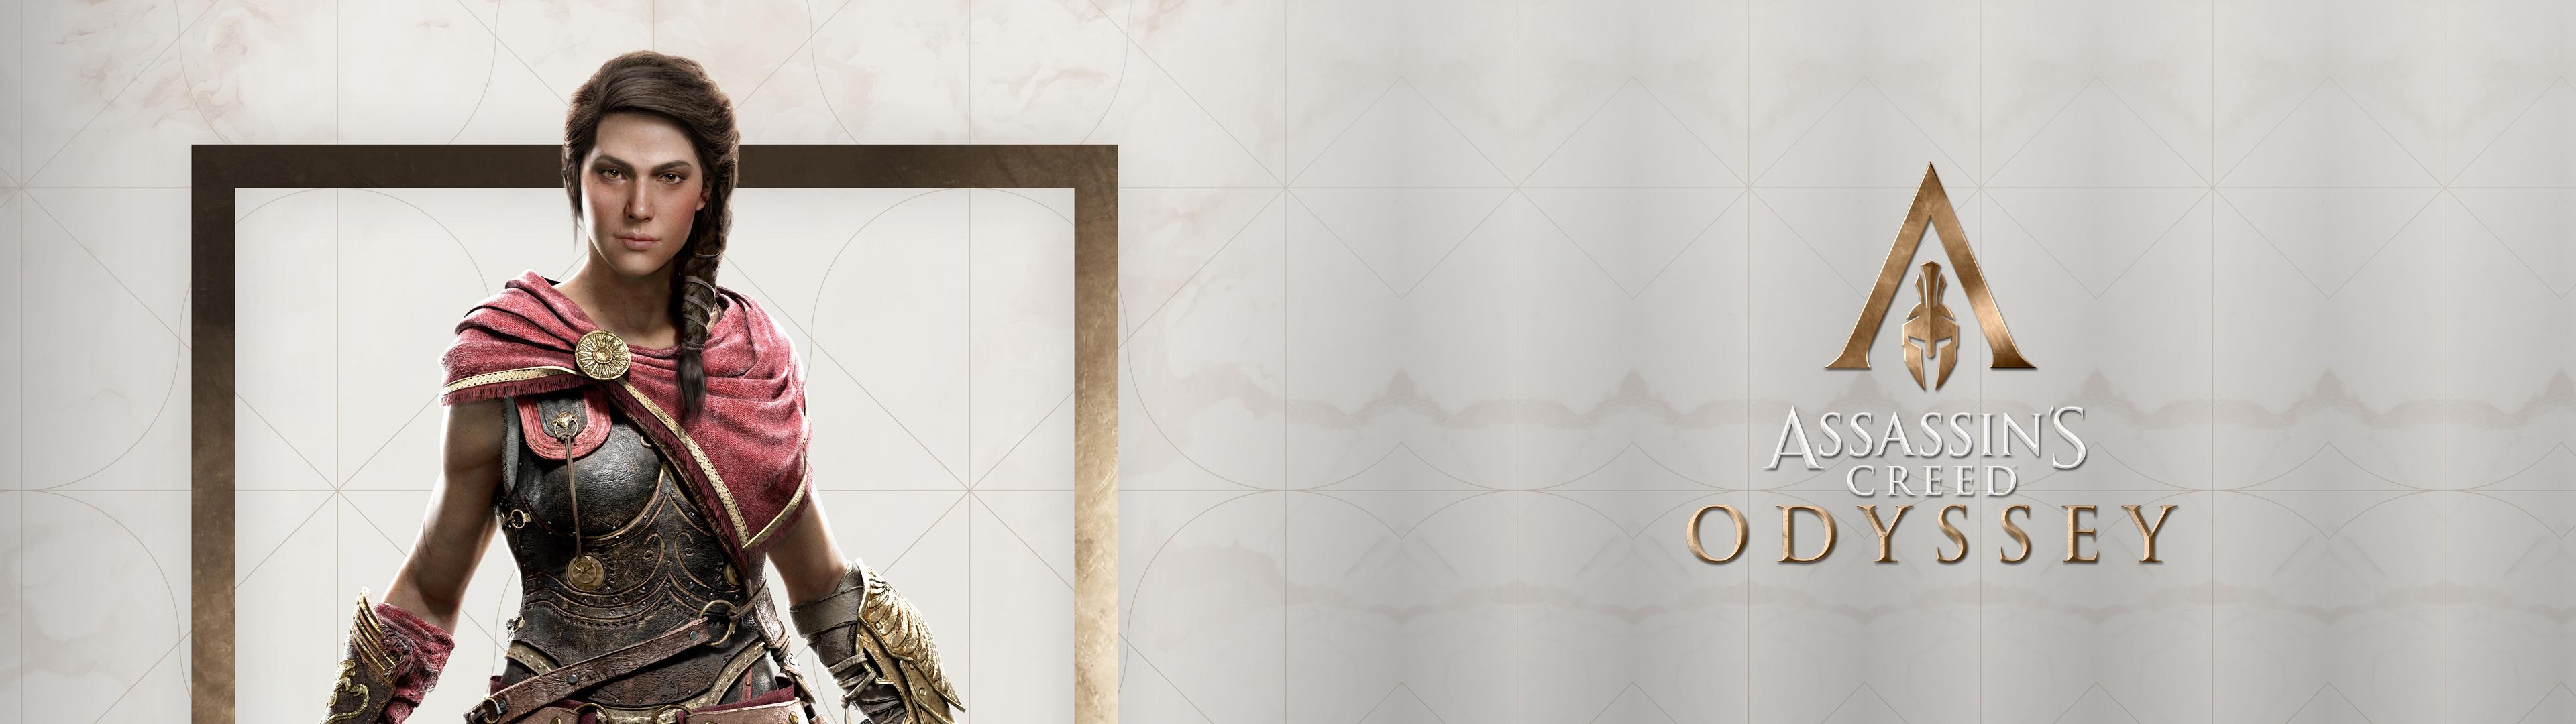 Wallpaper Assassins Creed Odyssey Dual Monitors Kassandra